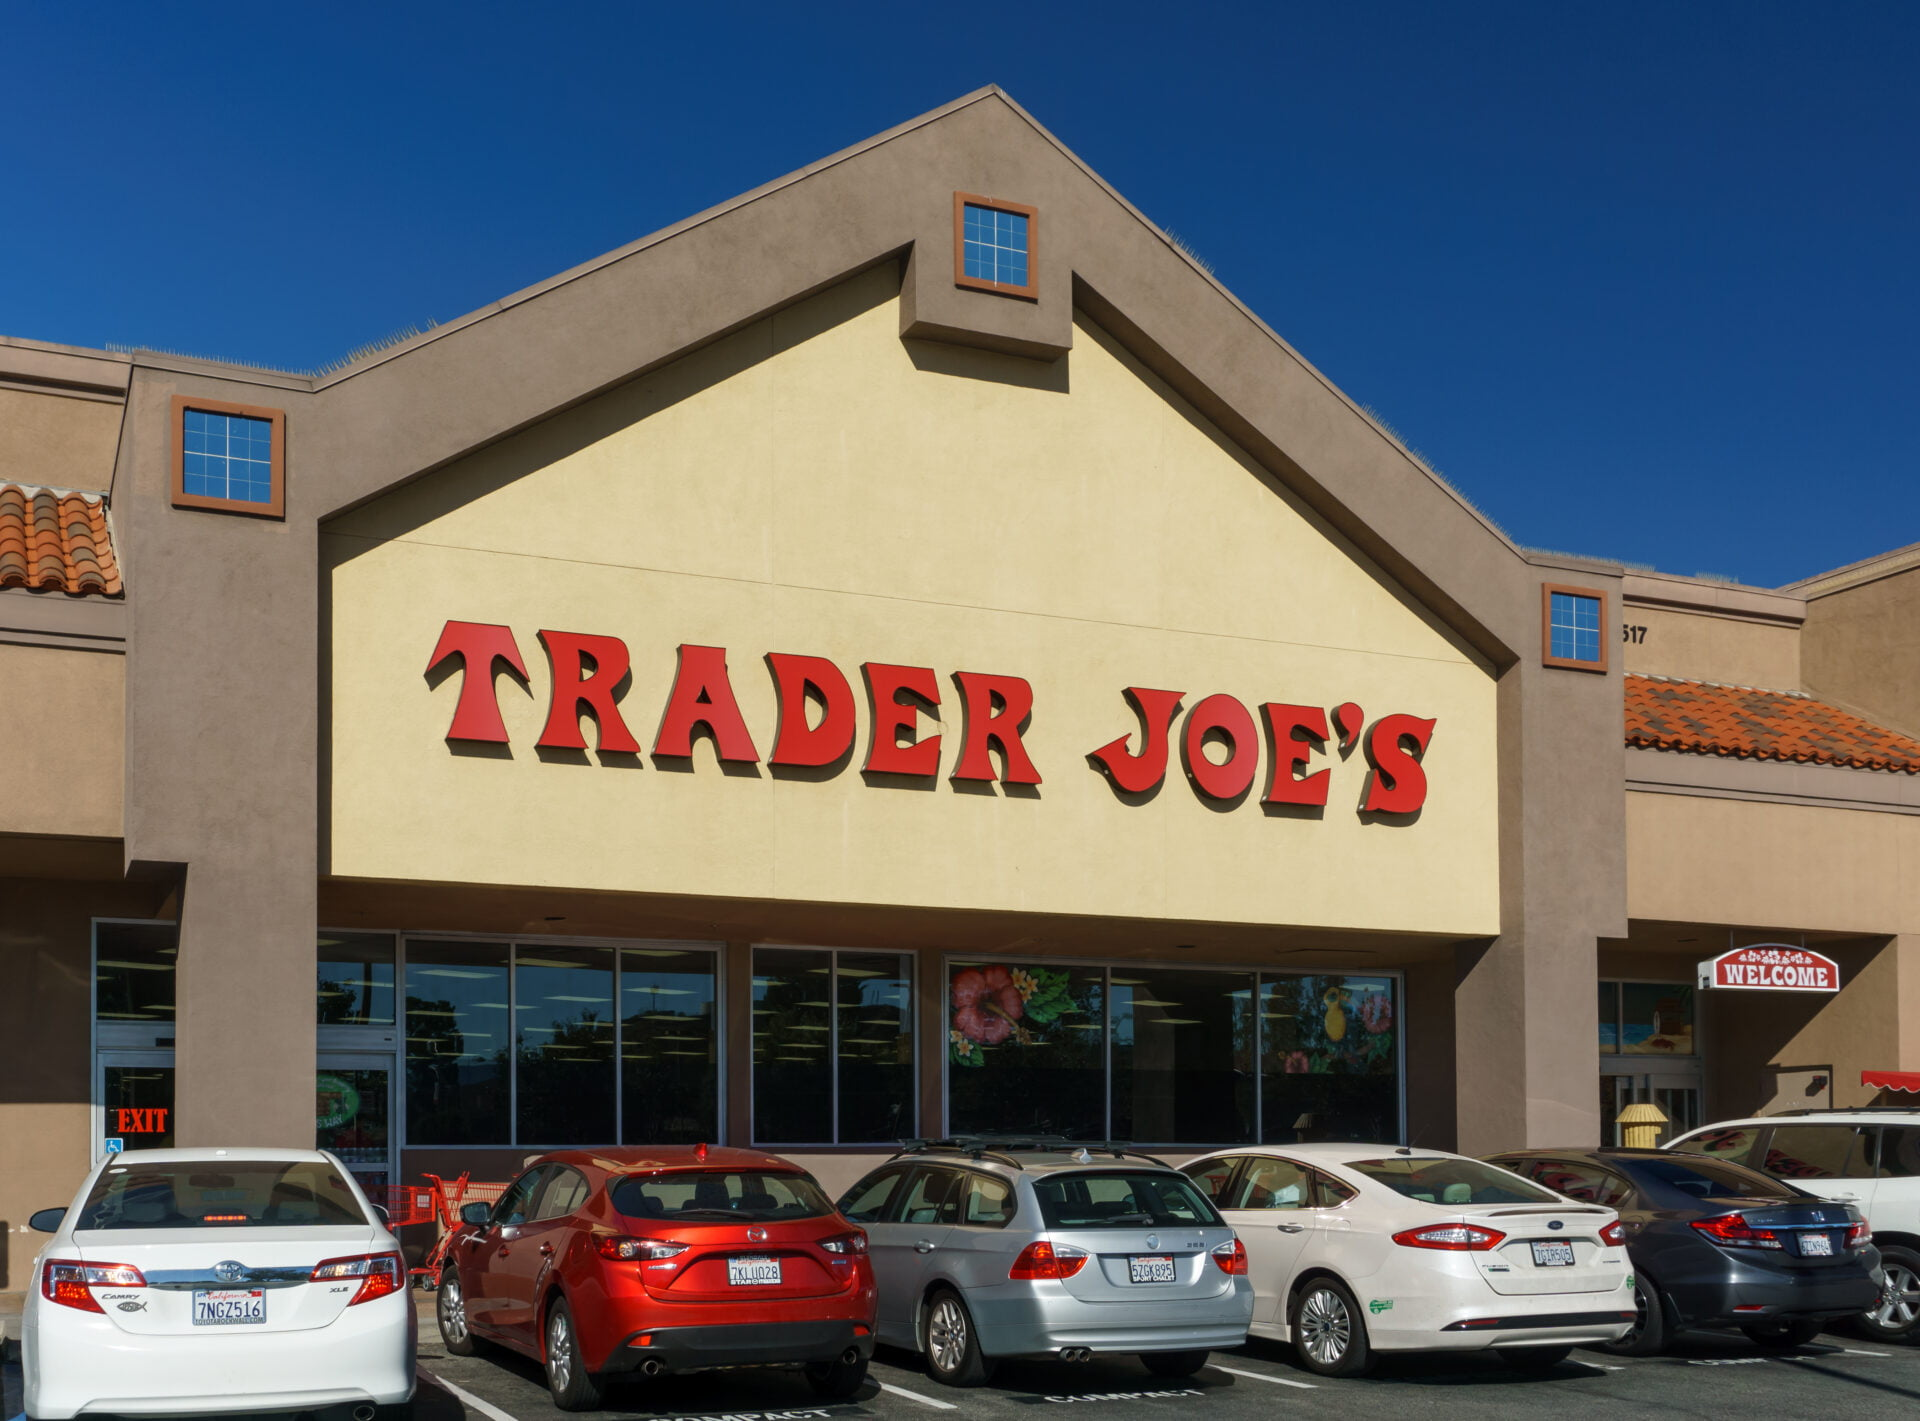 Trader Joes in Santa Clarita California